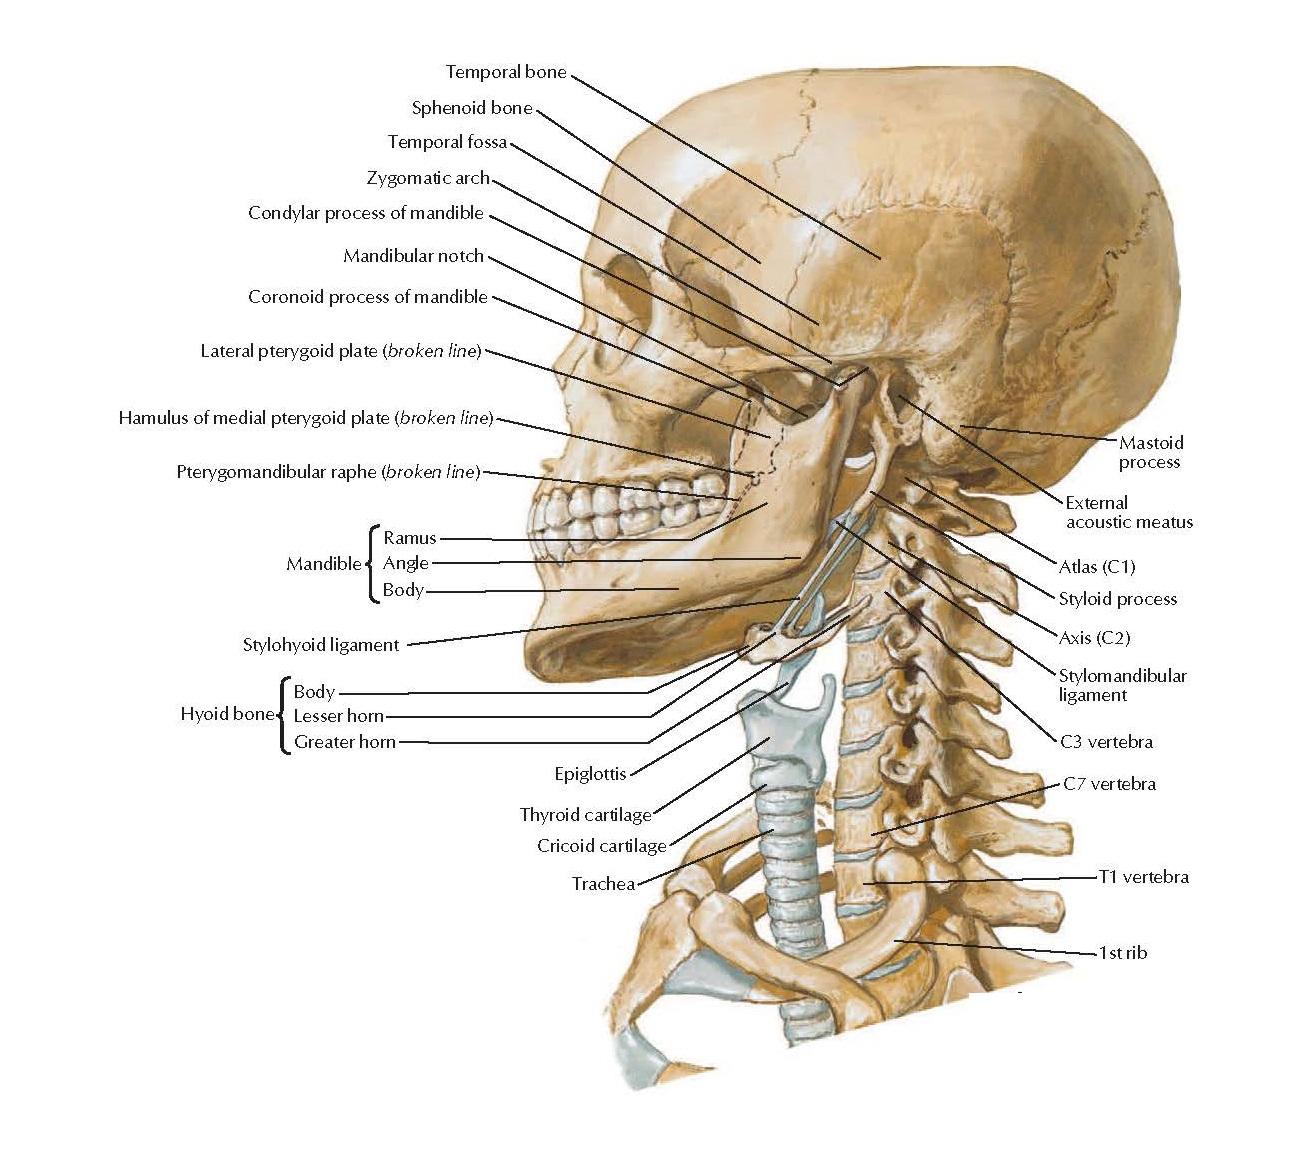 Bony Framework of Head and Neck Anatomy  Temporal bone, Sphenoid bone, Temporal fossa, Condylar process of mandible, Mandibular notch, Coronoid process of mandible, Lateral pterygoid plate (broken line), Hamulus of medial pterygoid plate (broken line), Pterygomandibular raphe (broken line), Mandible, Ramus, Angle, Body, Hyoid bone, Body, Lesser horn, Greater horn, Stylohyoid ligament, Epiglottis, Trachea, Thyroid cartilage, Cricoid cartilage. Mastoid process, External acoustic meatus, Stylomandibular ligament, C7 vertebra, T1 vertebra, 1st rib.